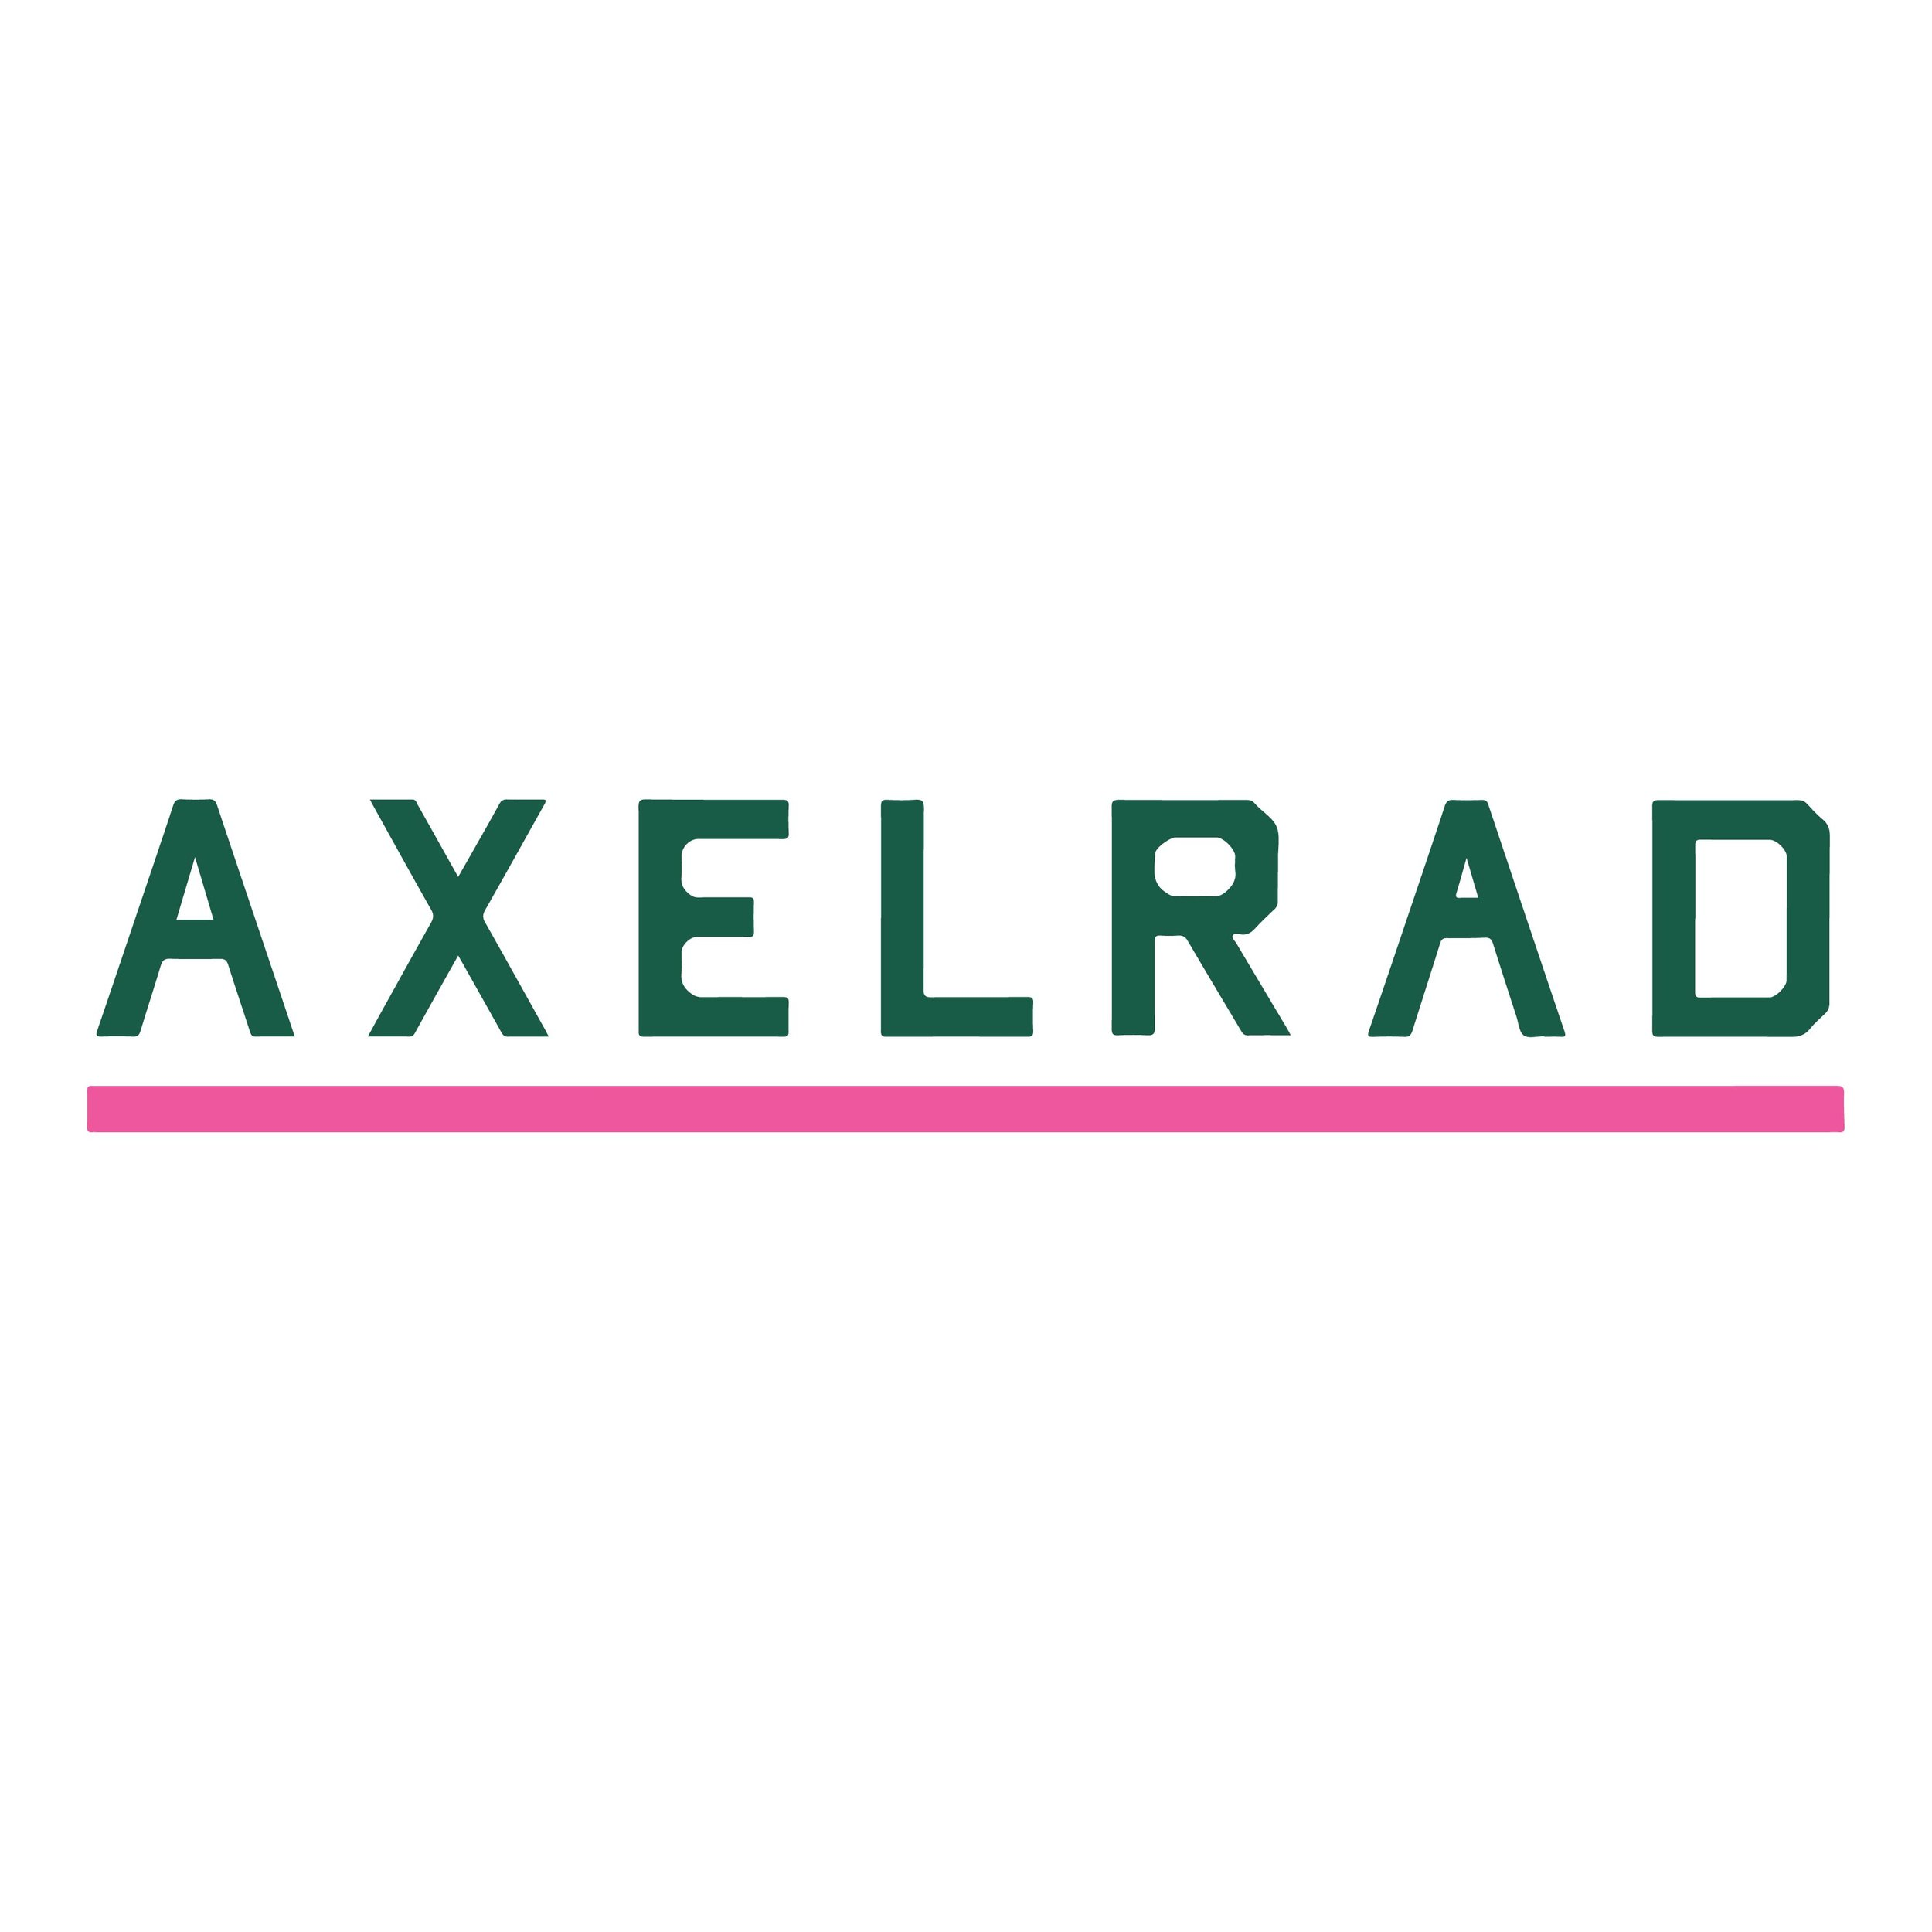 axerad-banner-01.jpg